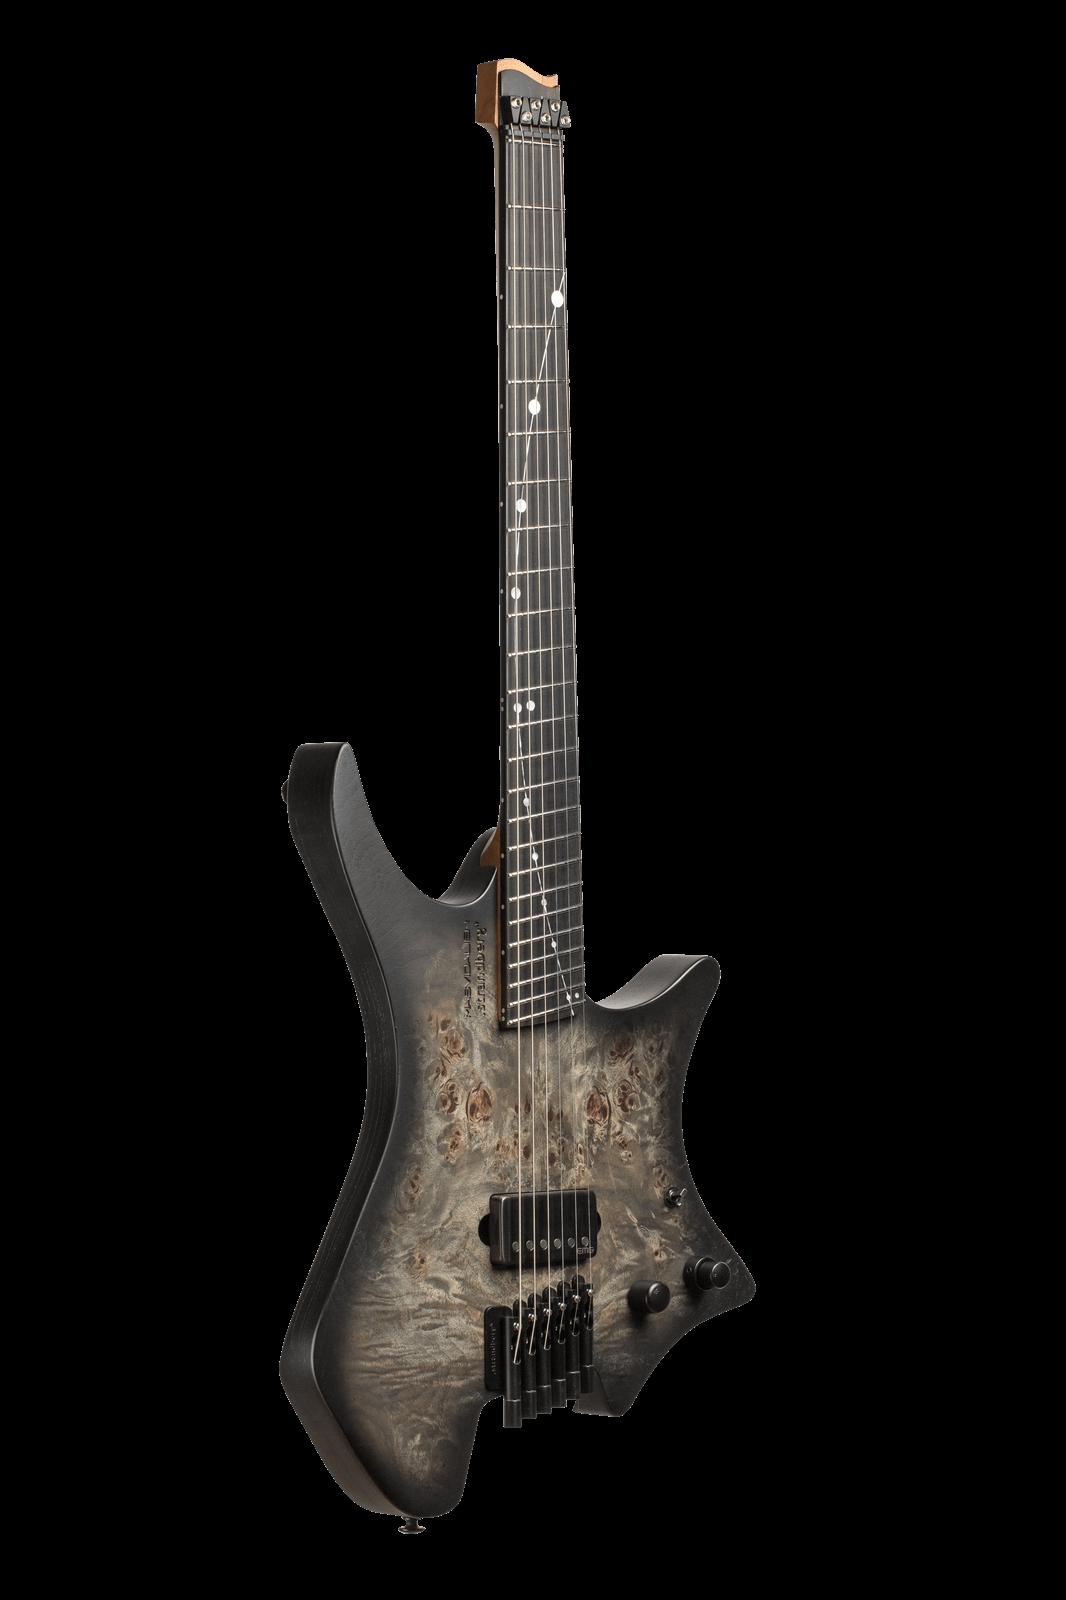 Electric Bass Guitar Wiring Diagrams Aria Diagram Boden Masvidalien Cosmo Strandberg Guitars 1066x1600